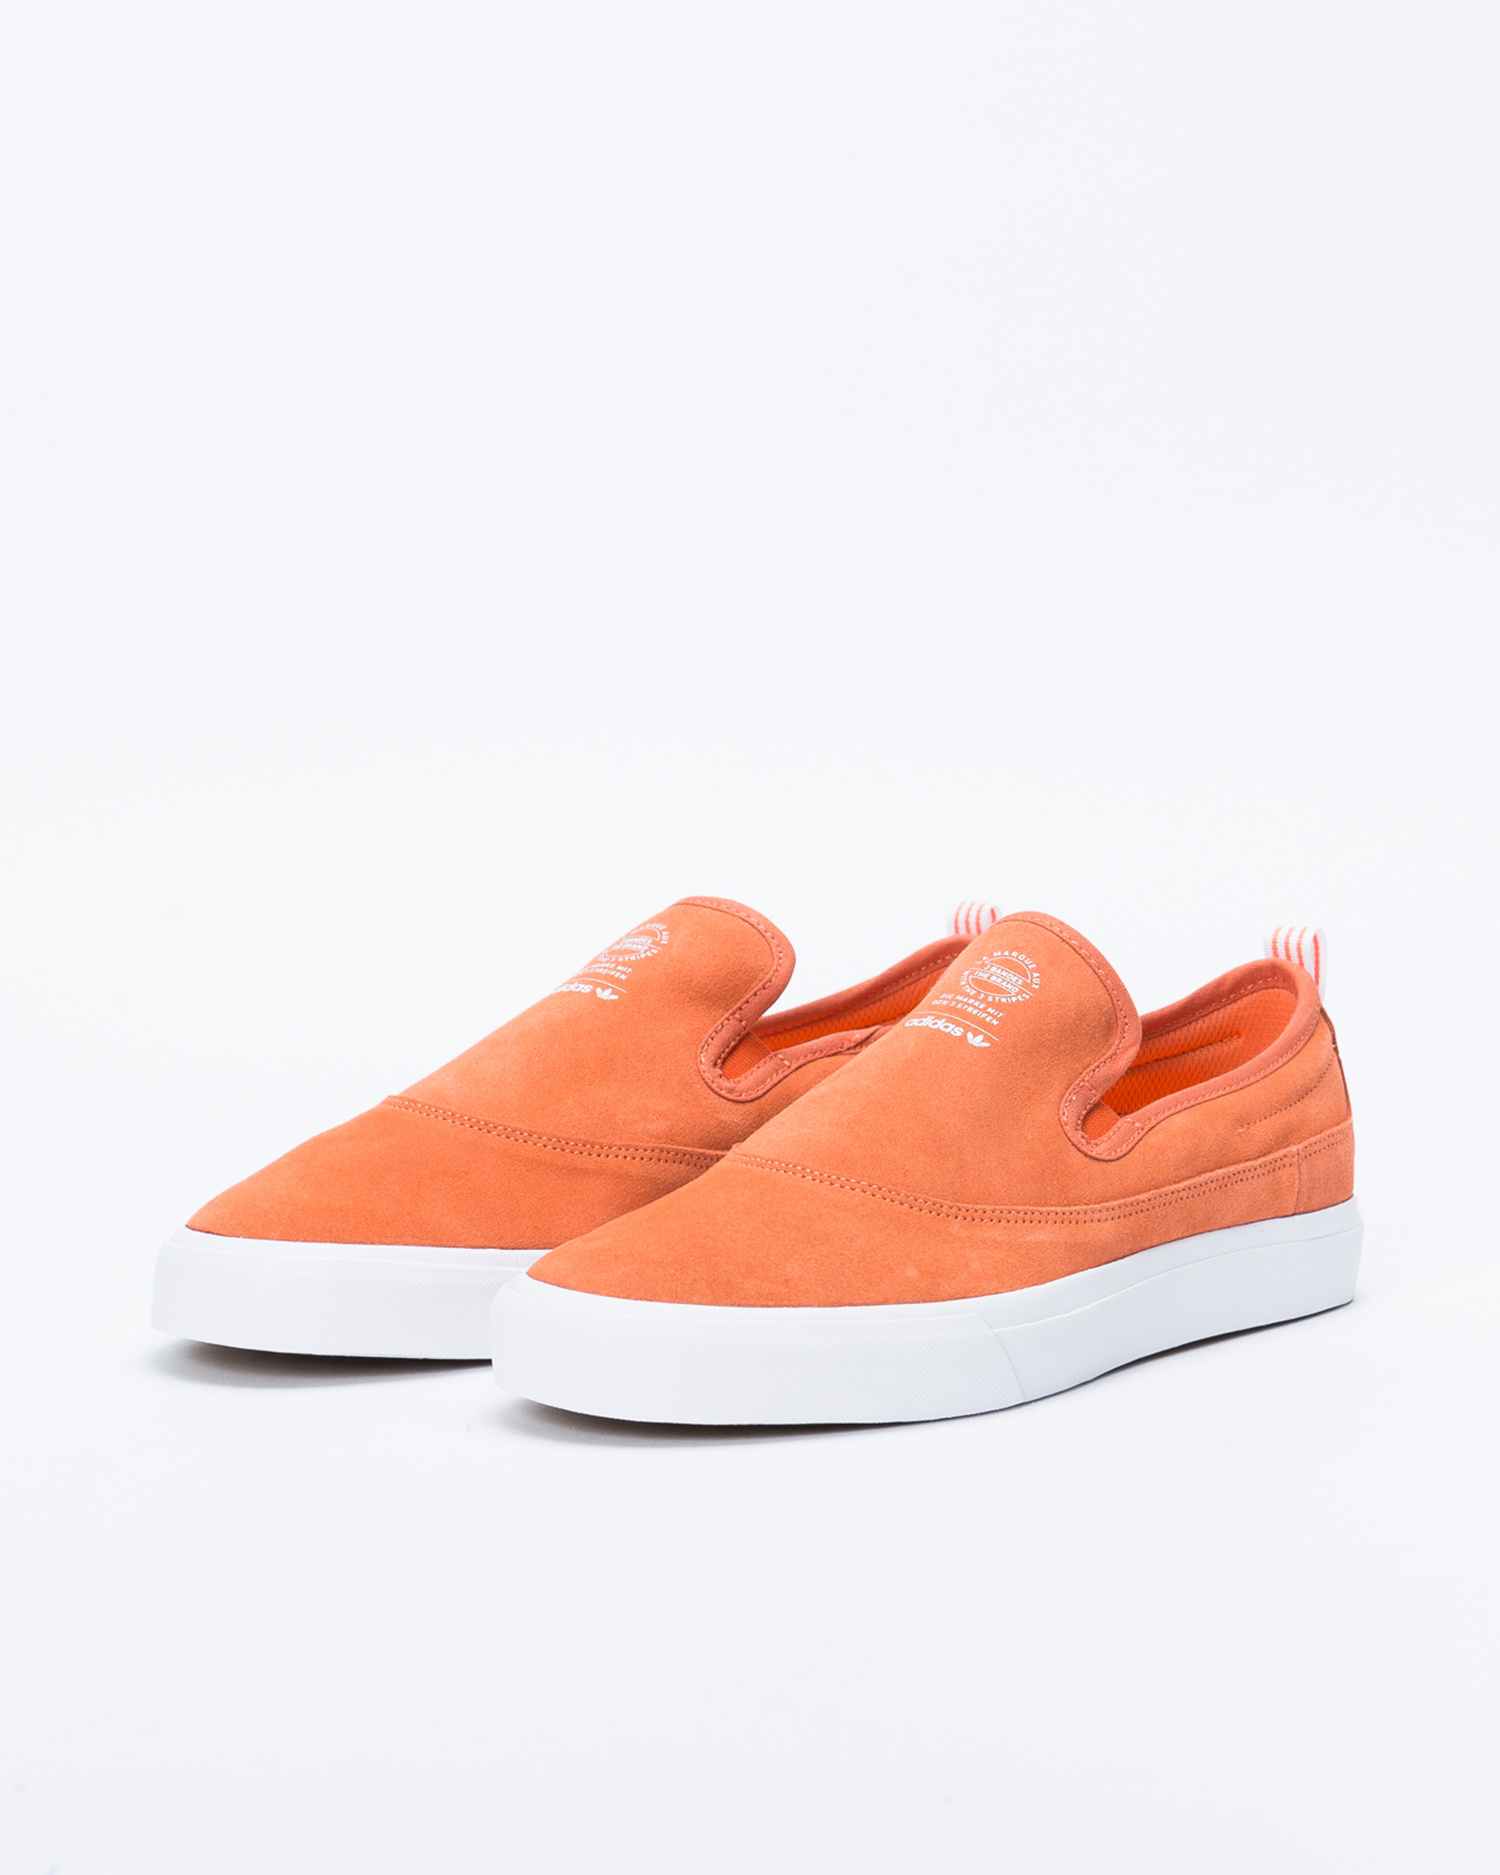 adidas Matchcourt Slip ADV Coral/White